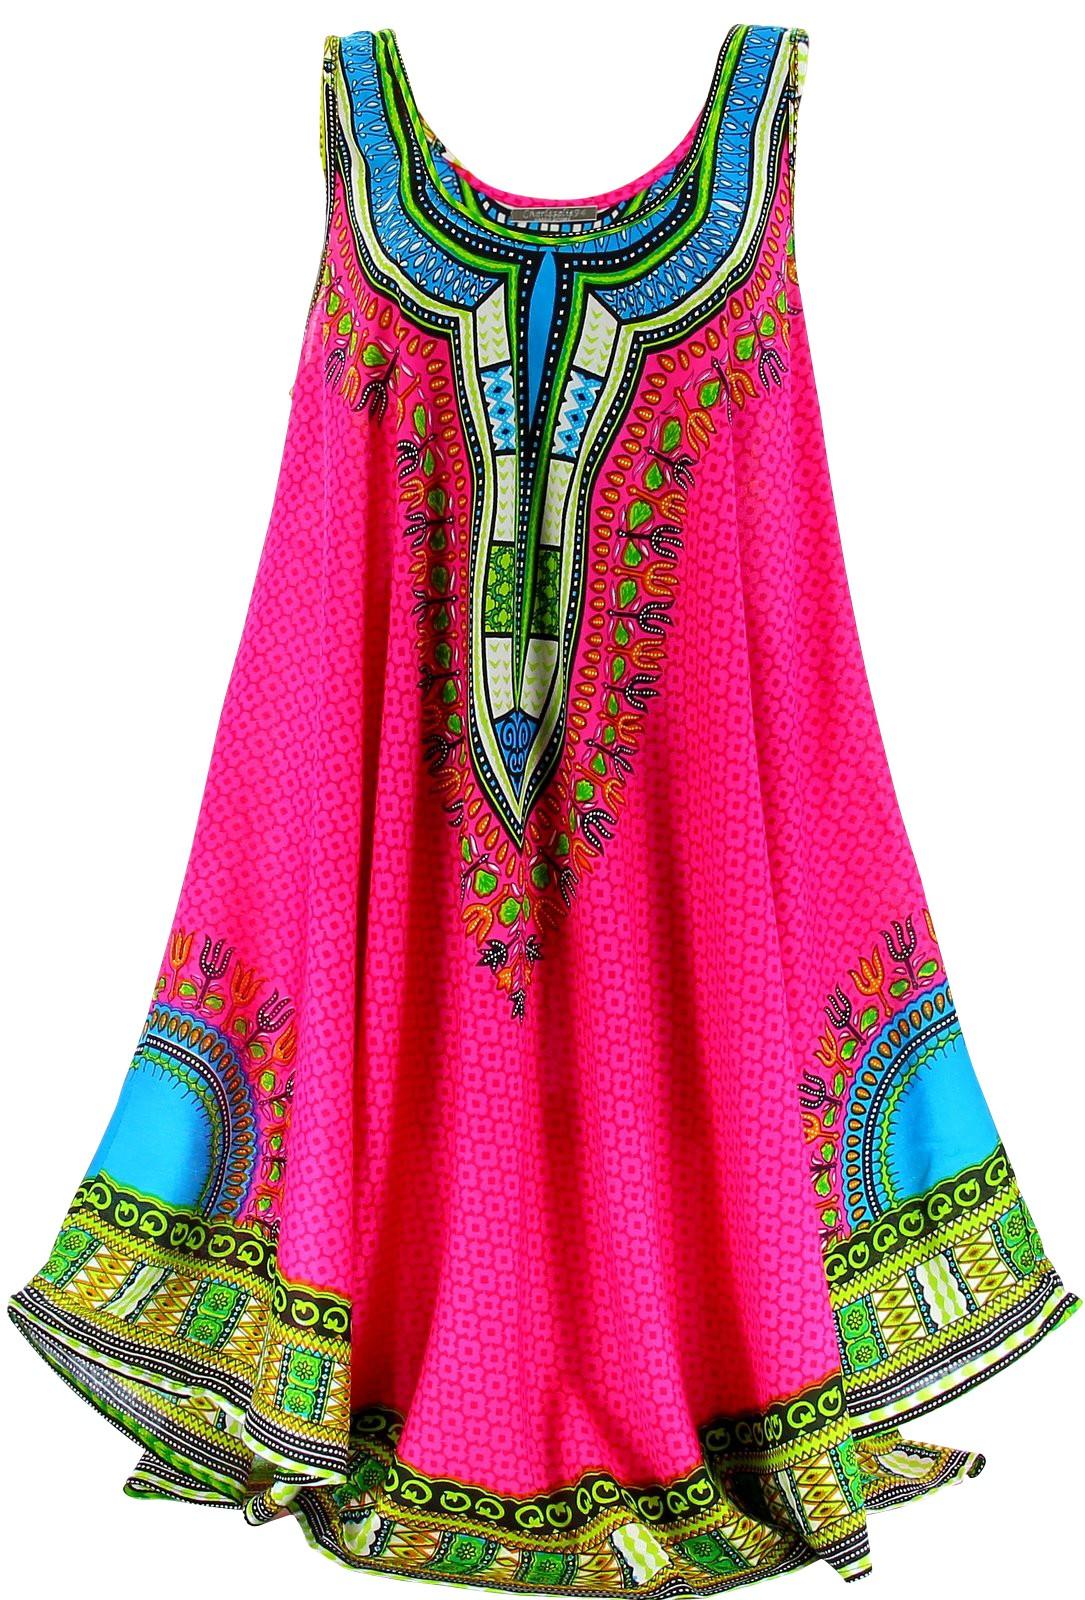 Robe T Ethnique Grande Taille Bohme Fushia INCAS